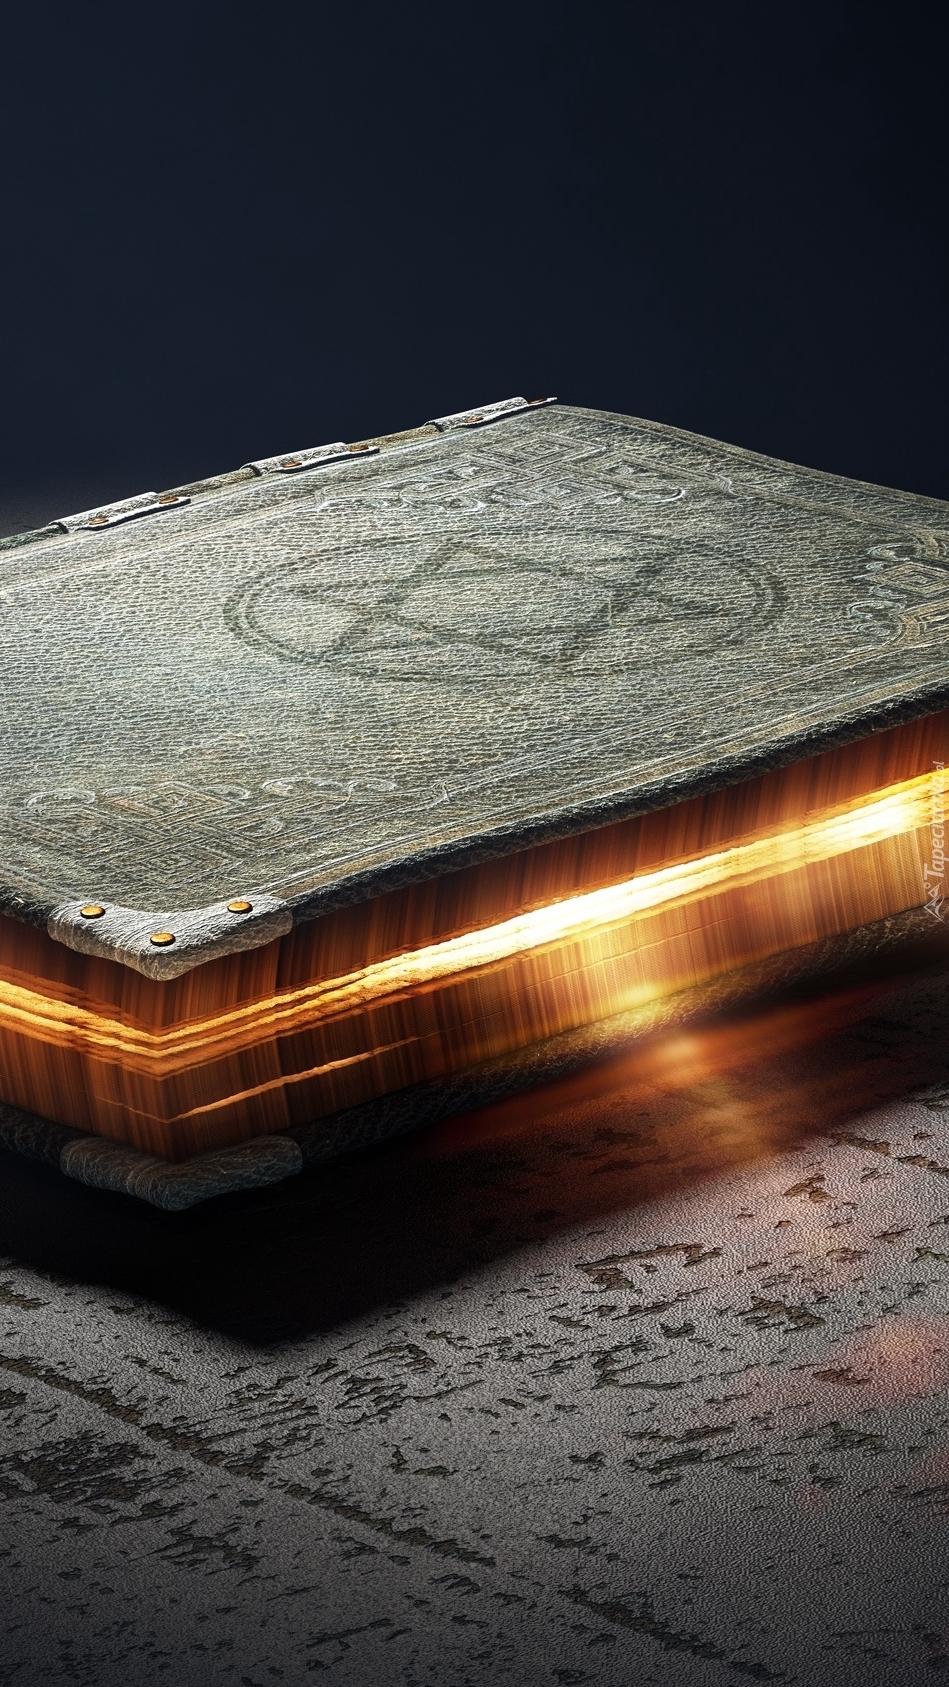 Magiczna księga